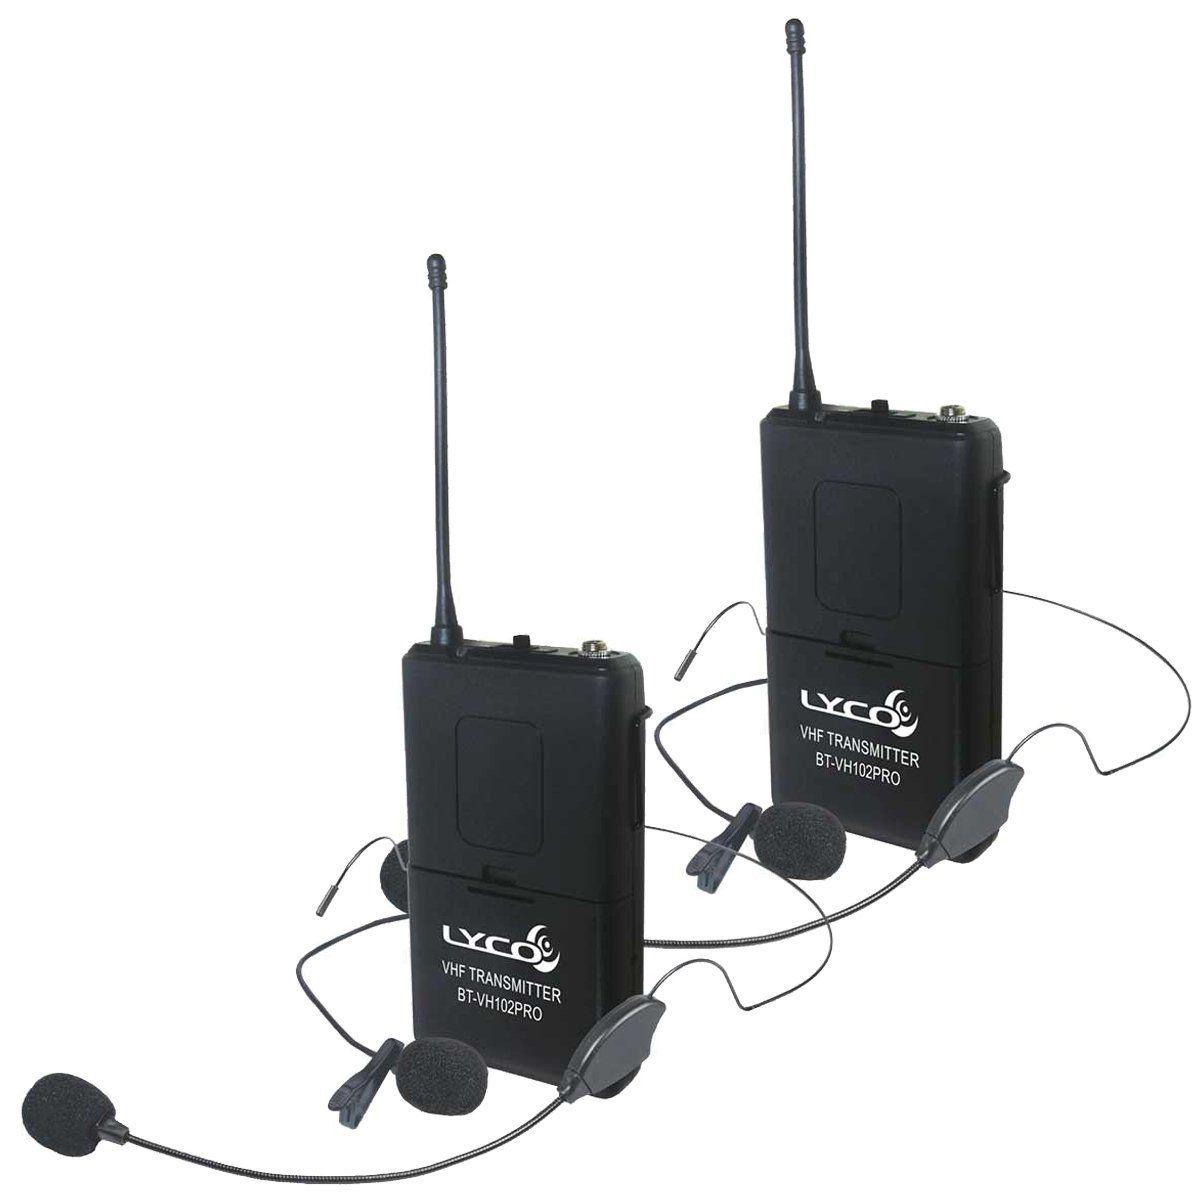 Microfone sem Fio Lyco VH202 PROHLHL Headset e Lapela